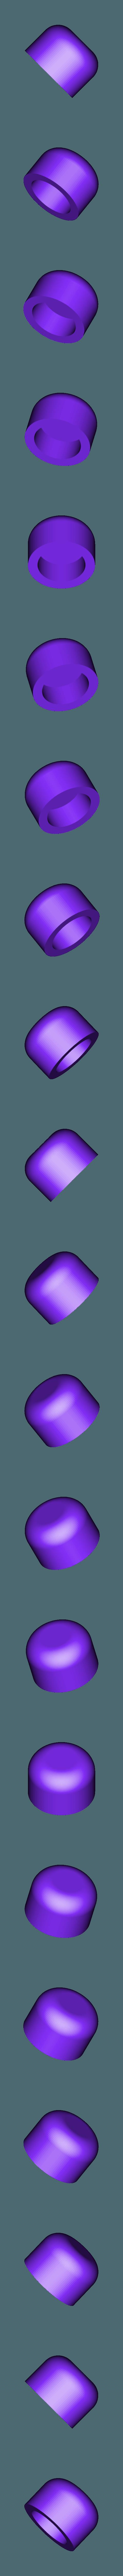 arm-connectB1.stl Download free STL file Mechnolia • 3D printing template, ChrisBobo